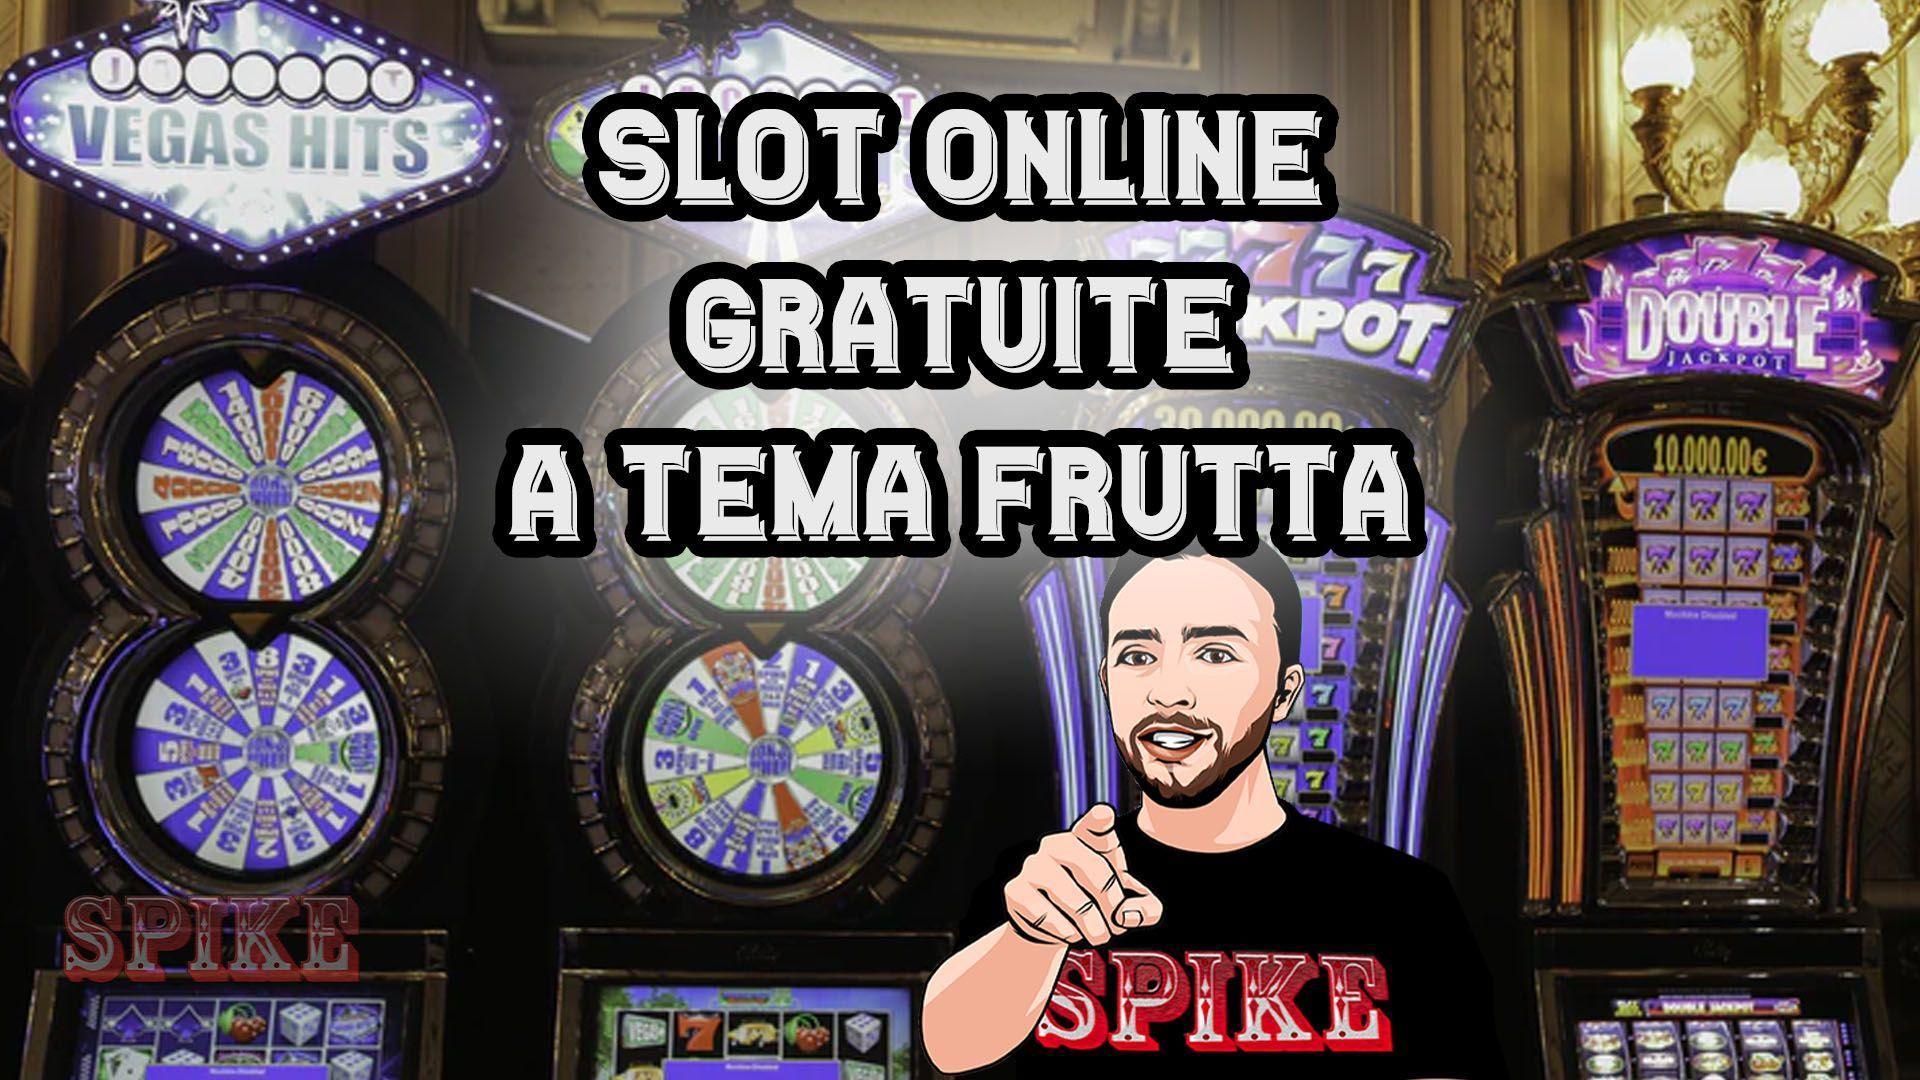 Slot Online Gratis a Tema Frutta Card